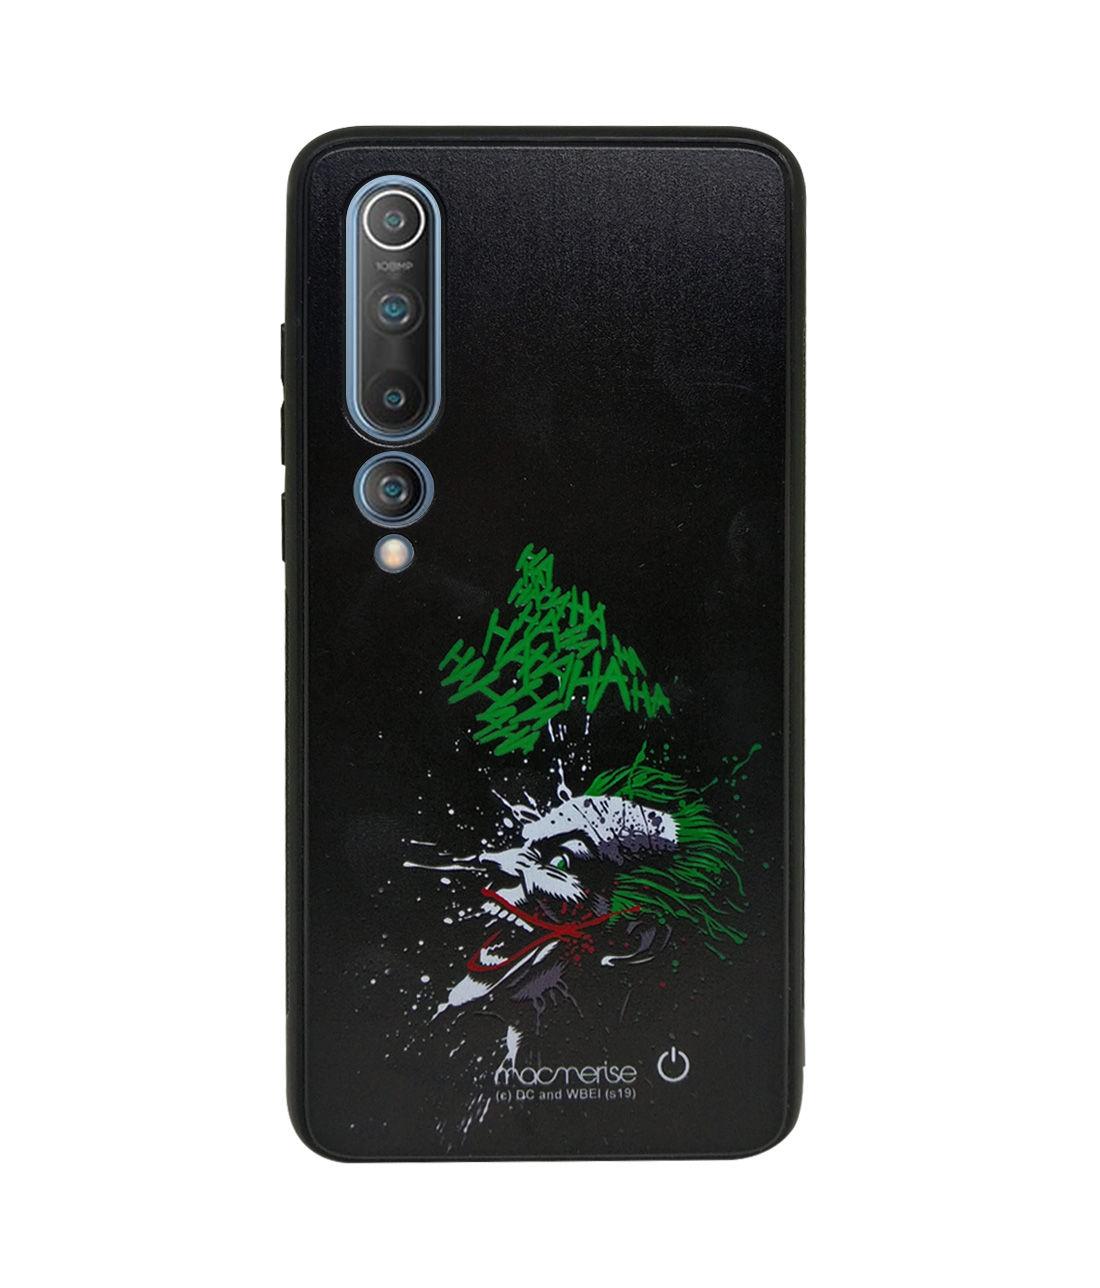 Sinister Joker Laugh - Lumous LED Phone Case for Xiaomi Mi 10